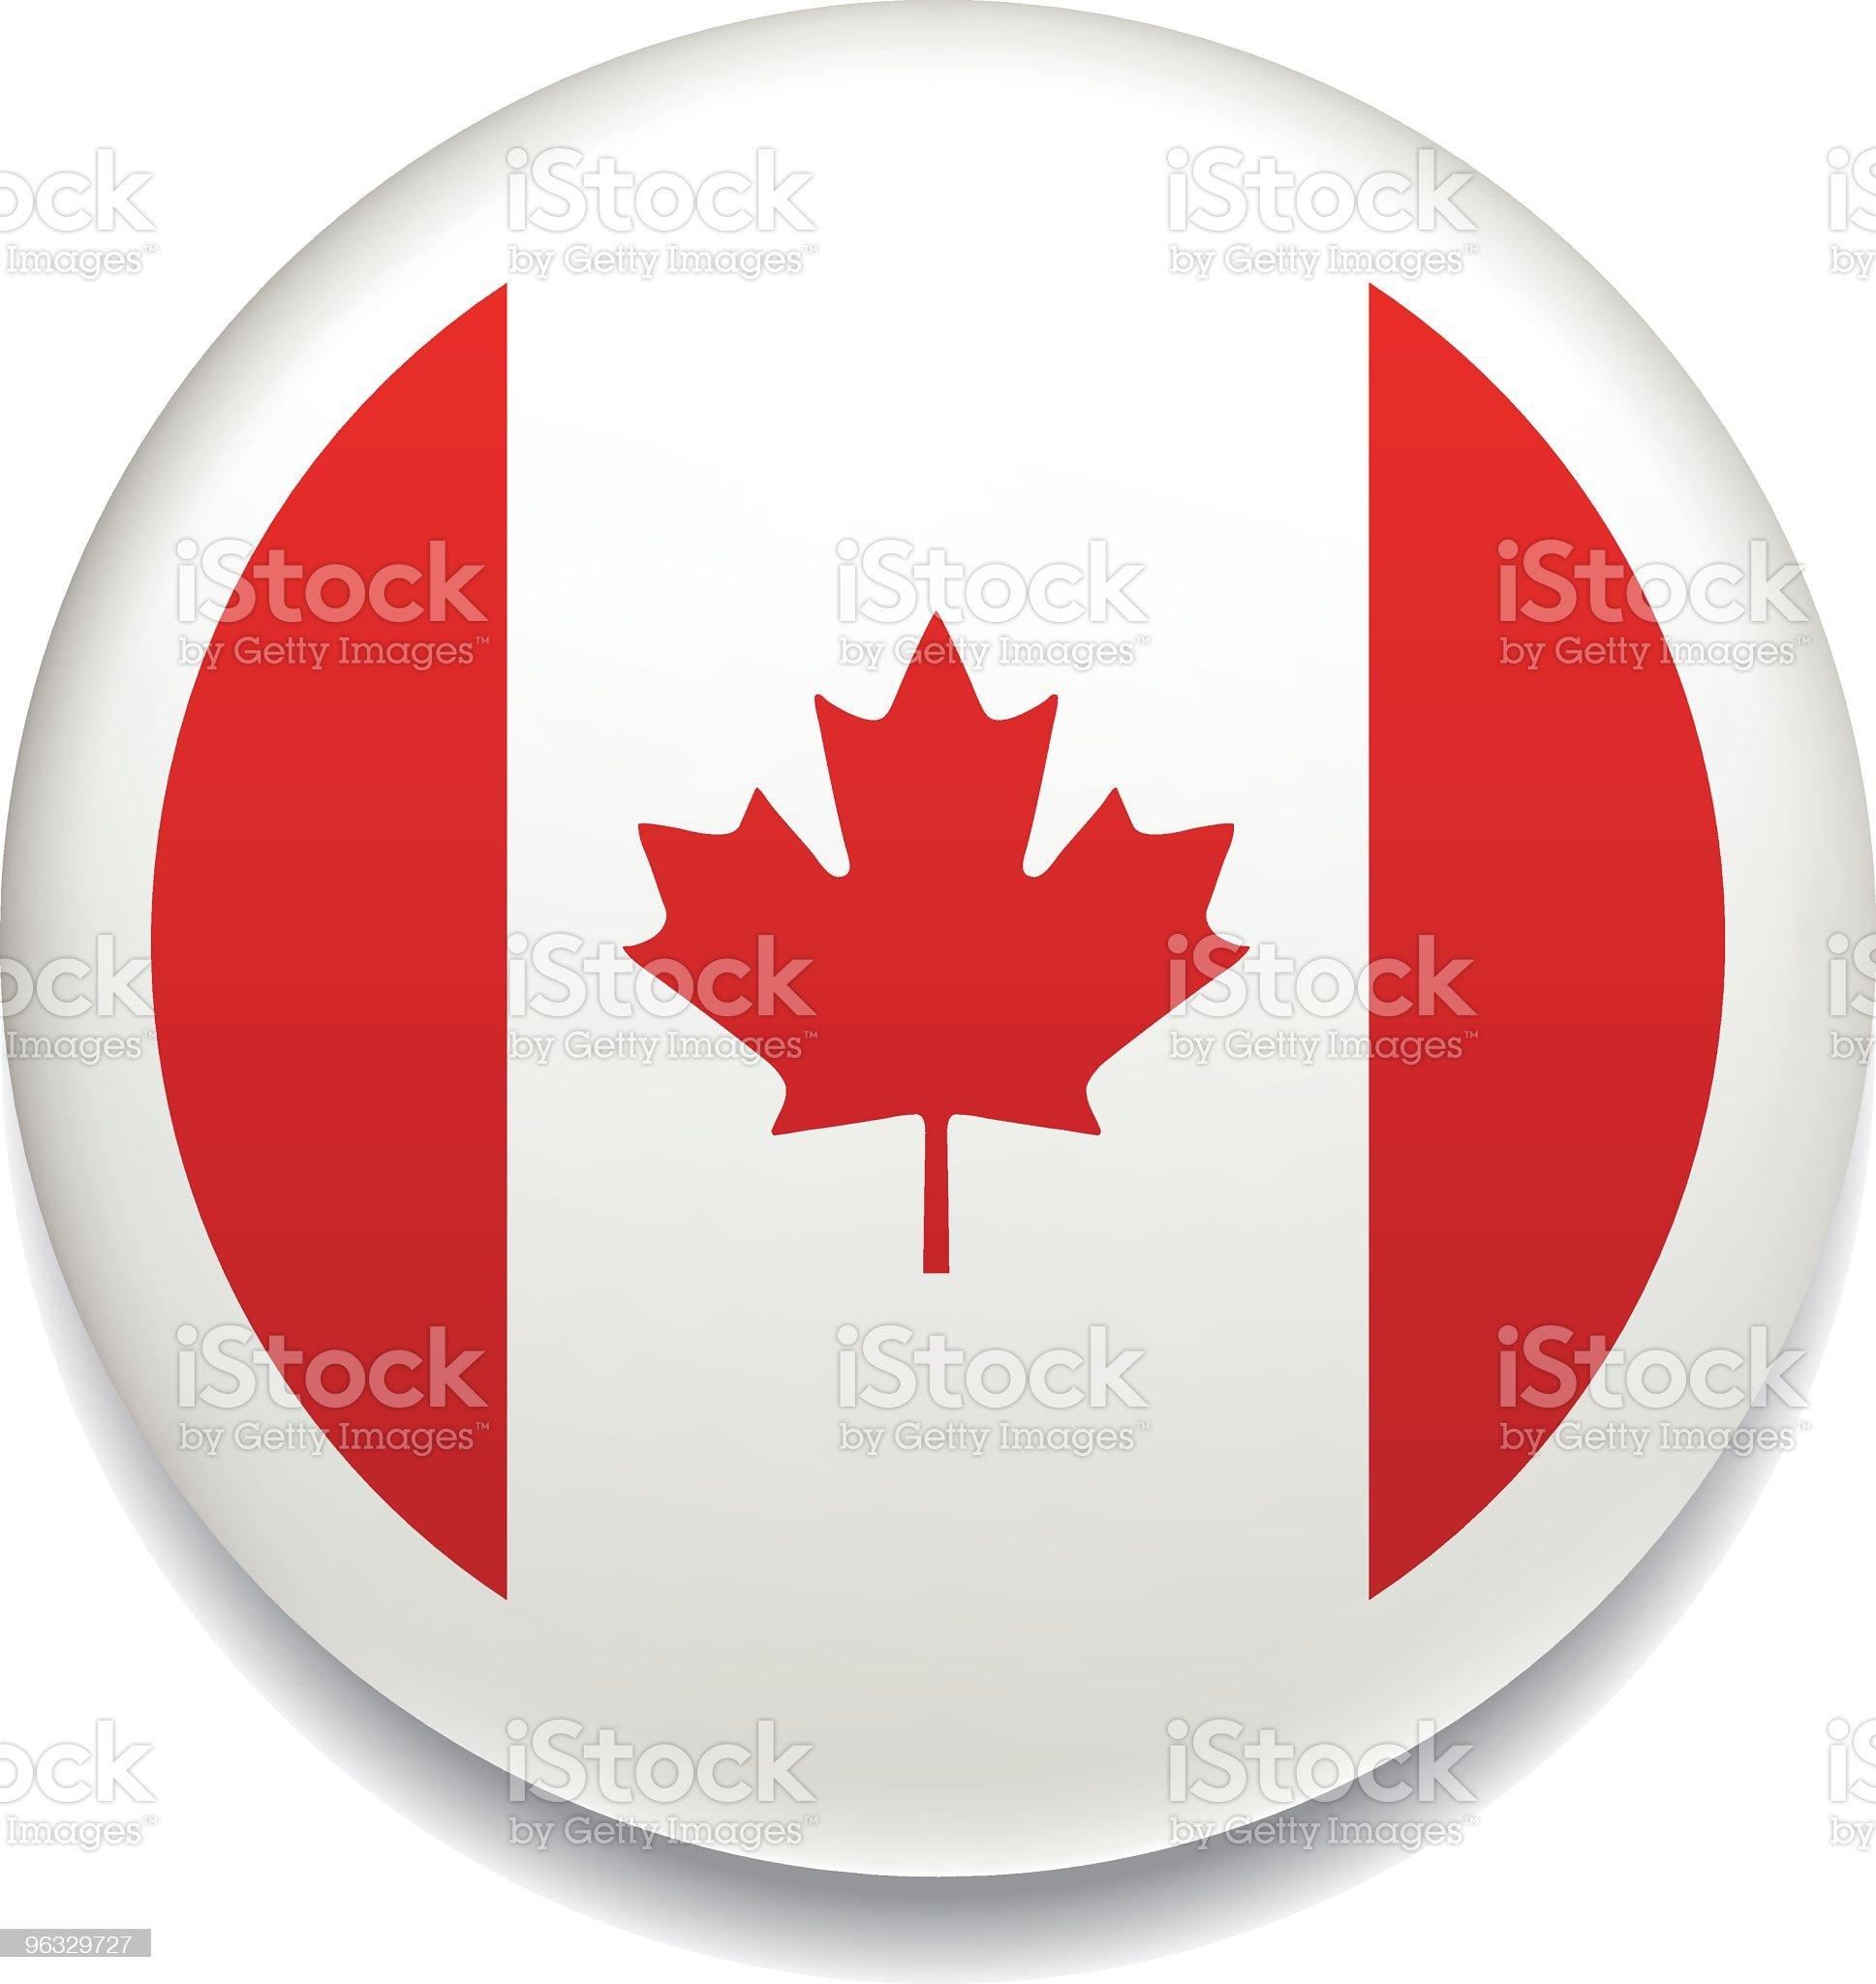 Canadian flag vector button royalty-free stock vector art